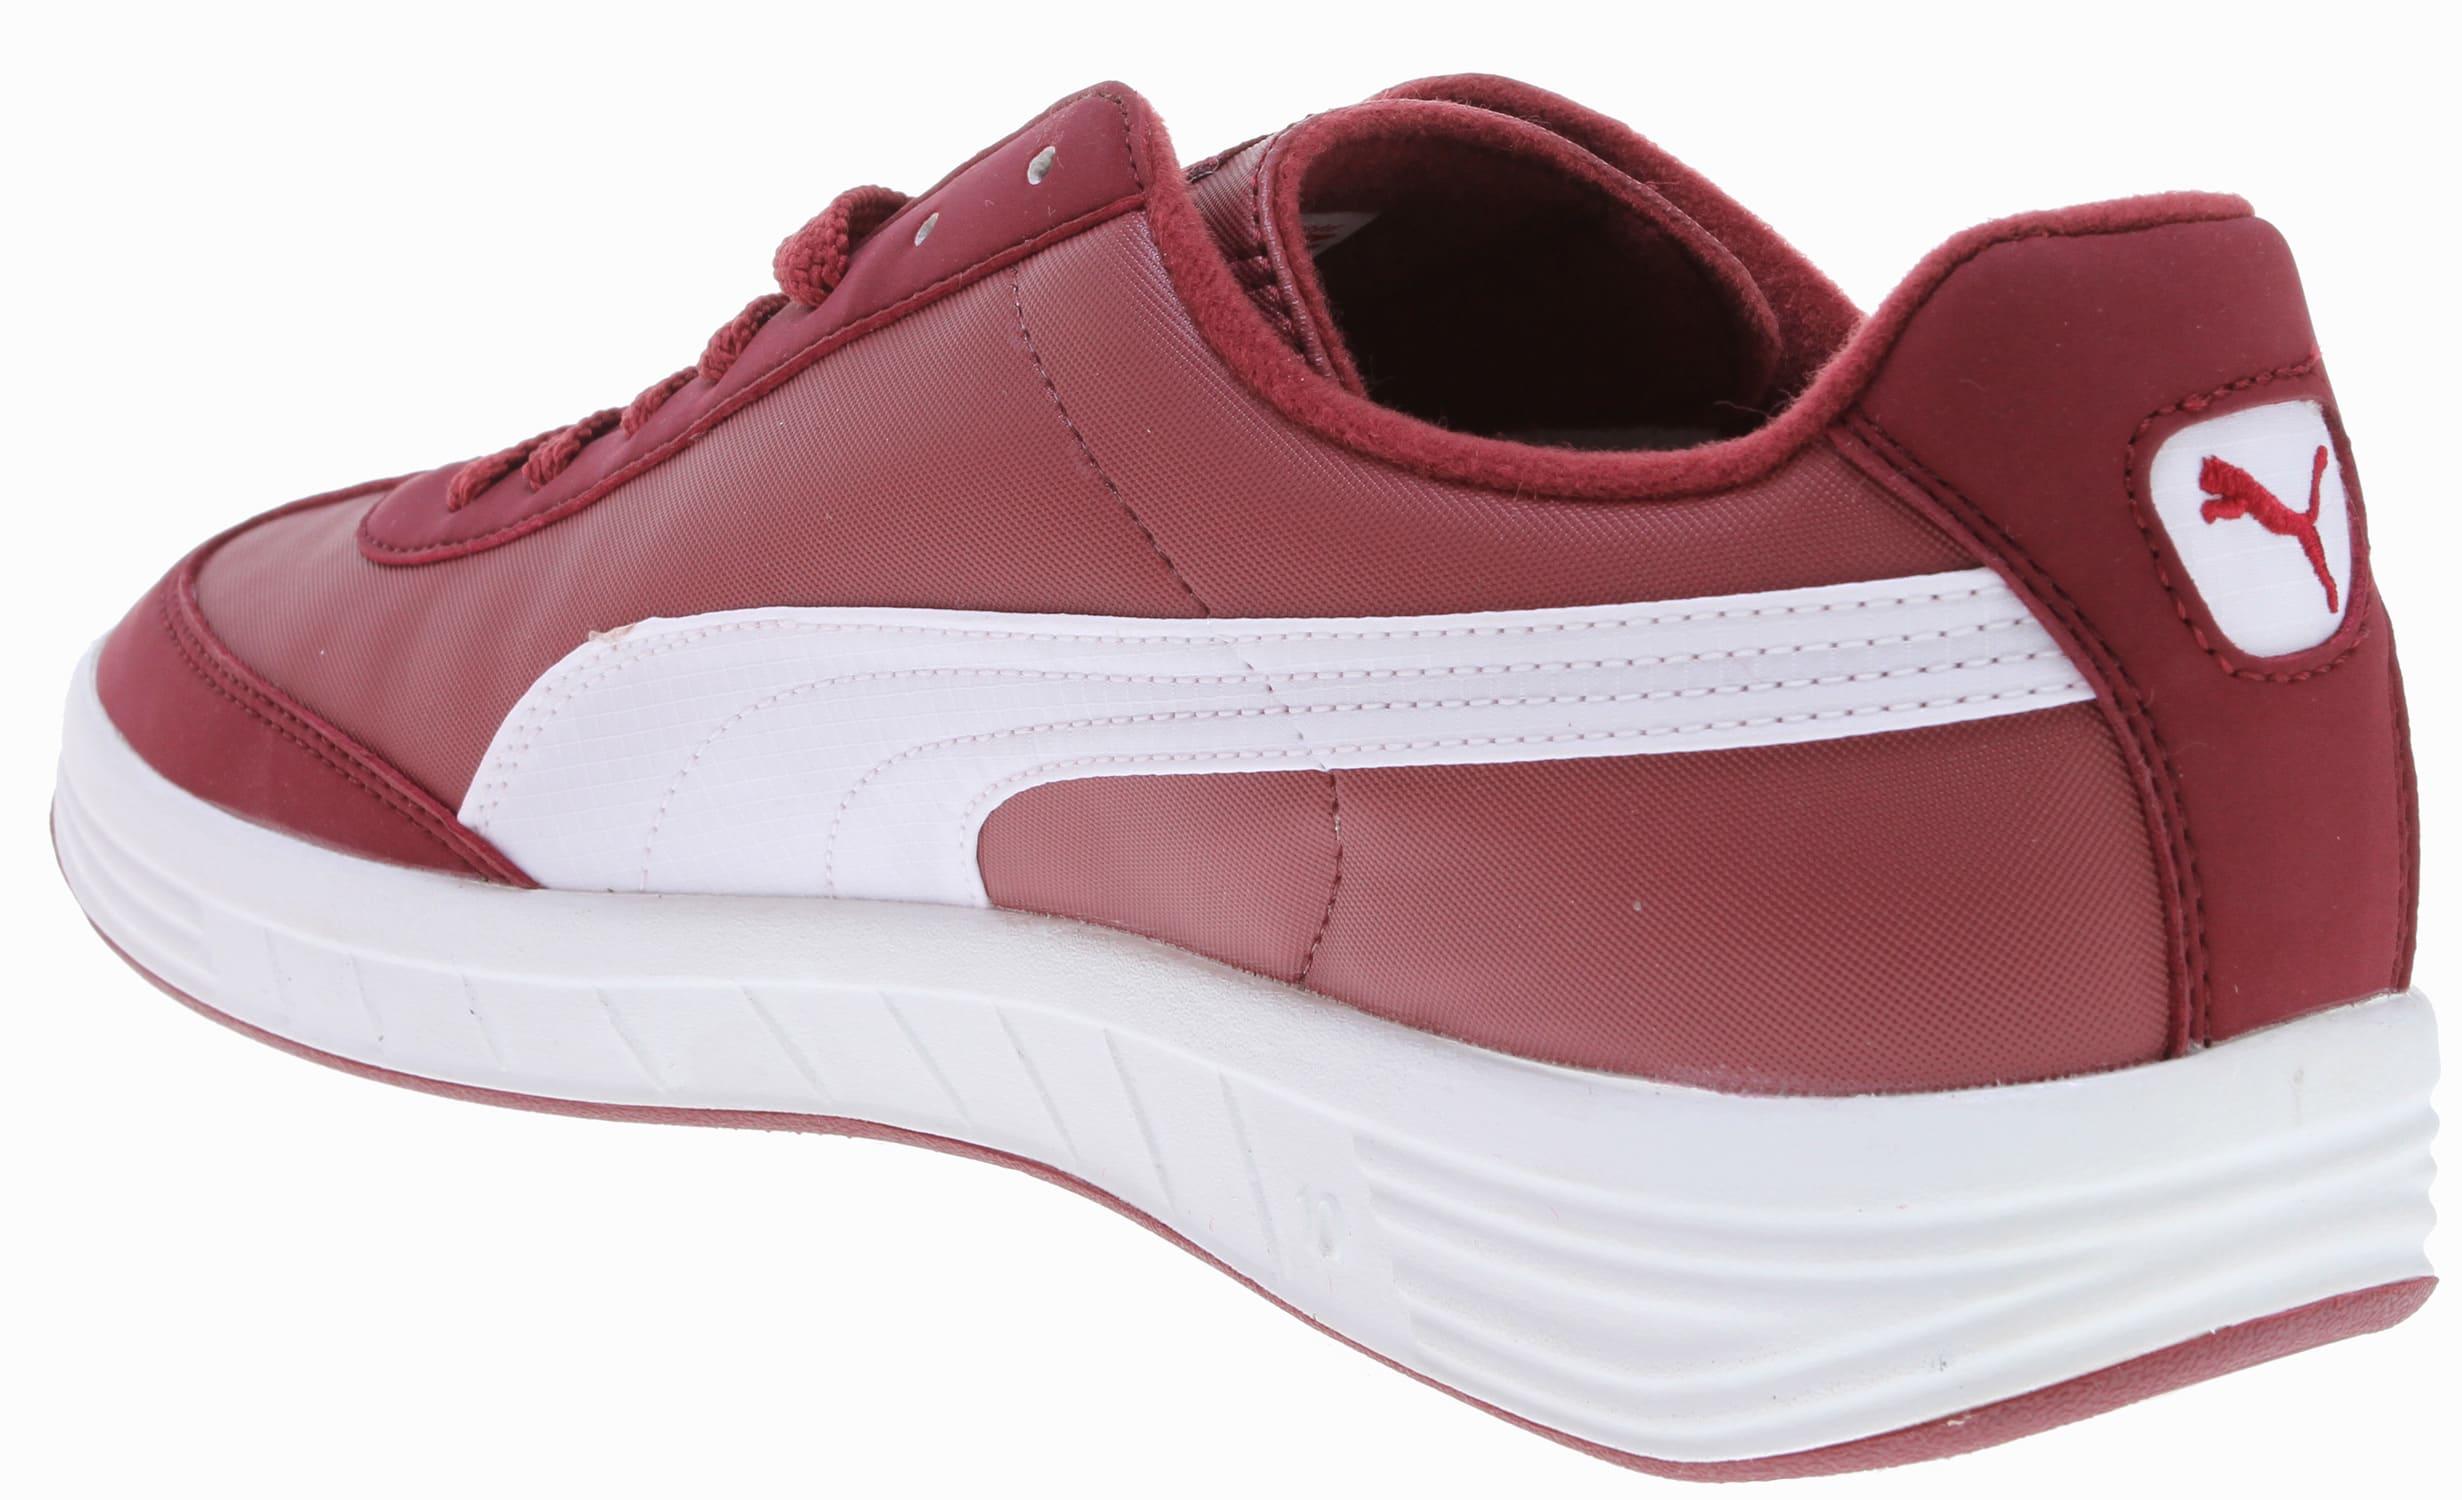 Puma Argentina Nbk Shoes - thumbnail 3 c6e198b23